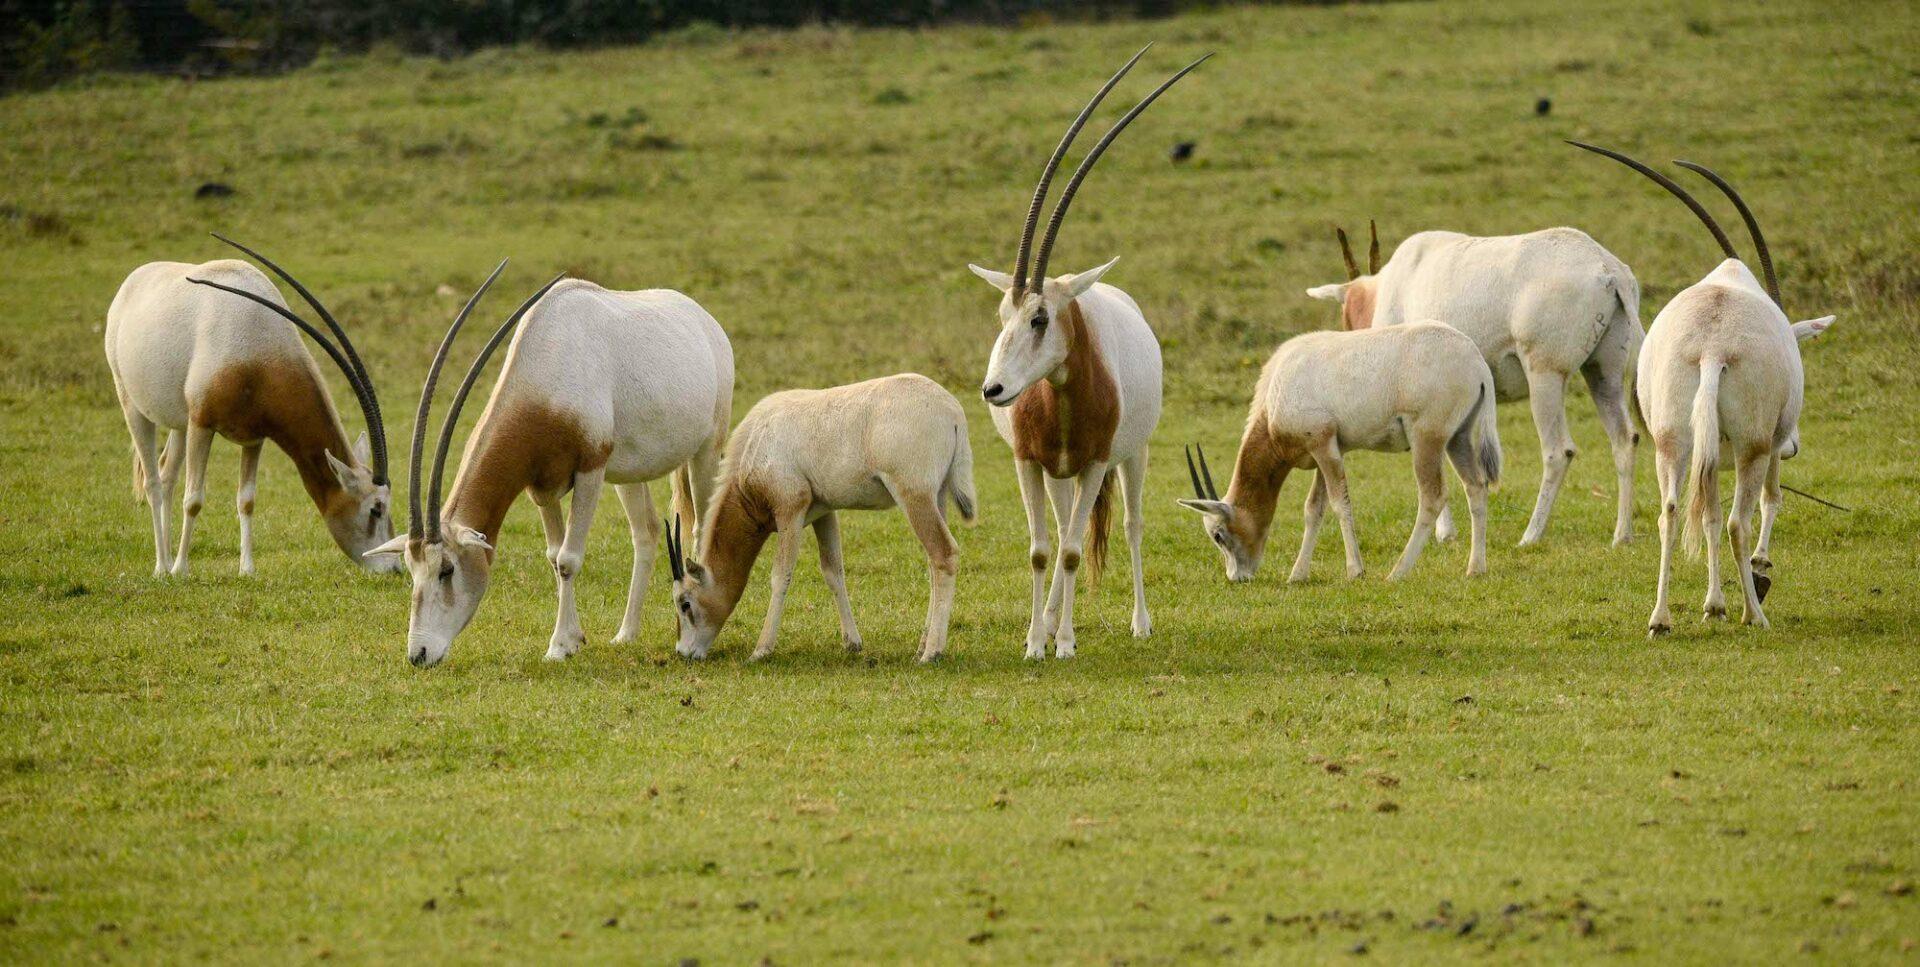 Scimitar Horned Oryx Oryx Dammah Marwell Zoo Hannah Pearce Oryx 2